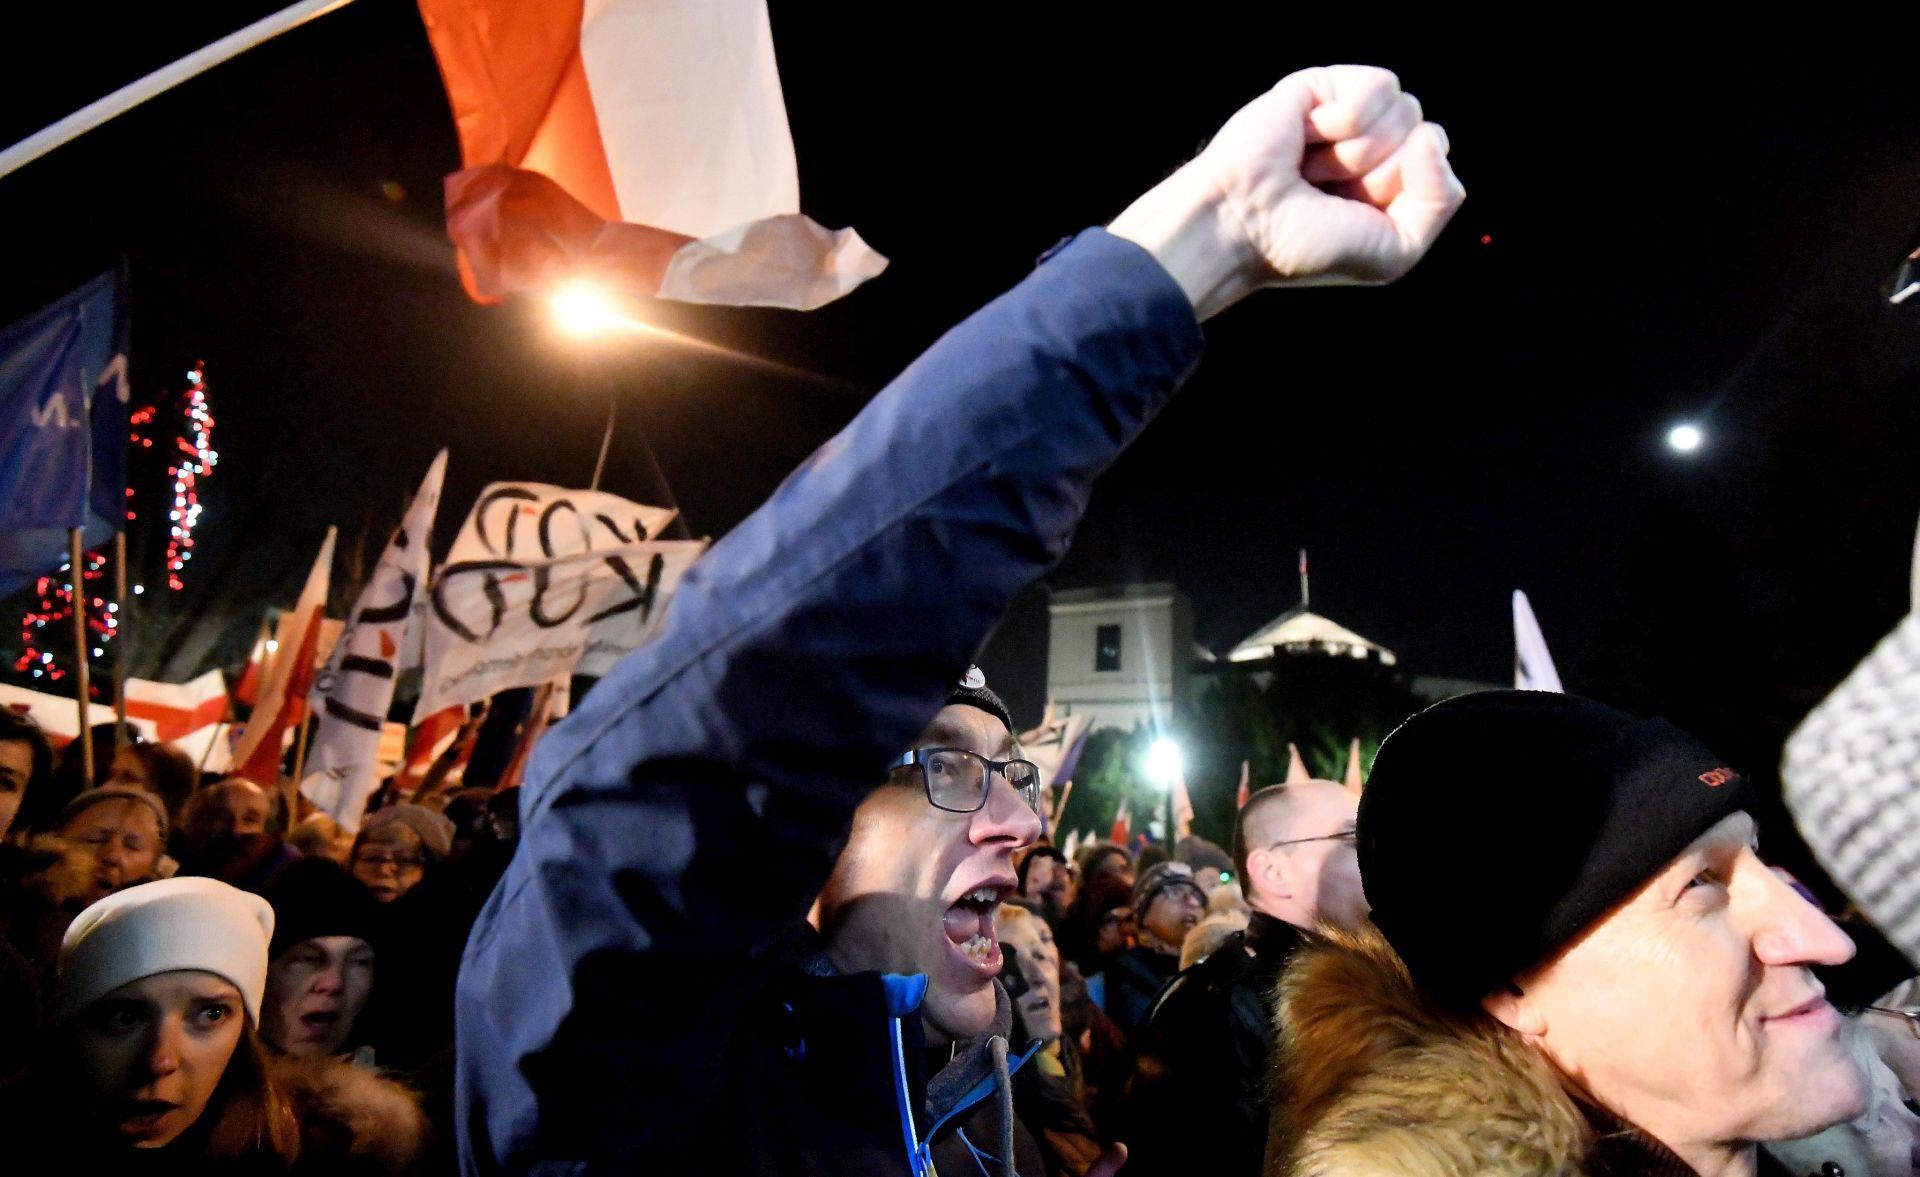 Policija probila blokadu poljskog parlamenta, Szydlo i Kaczynski uspjeli izaći